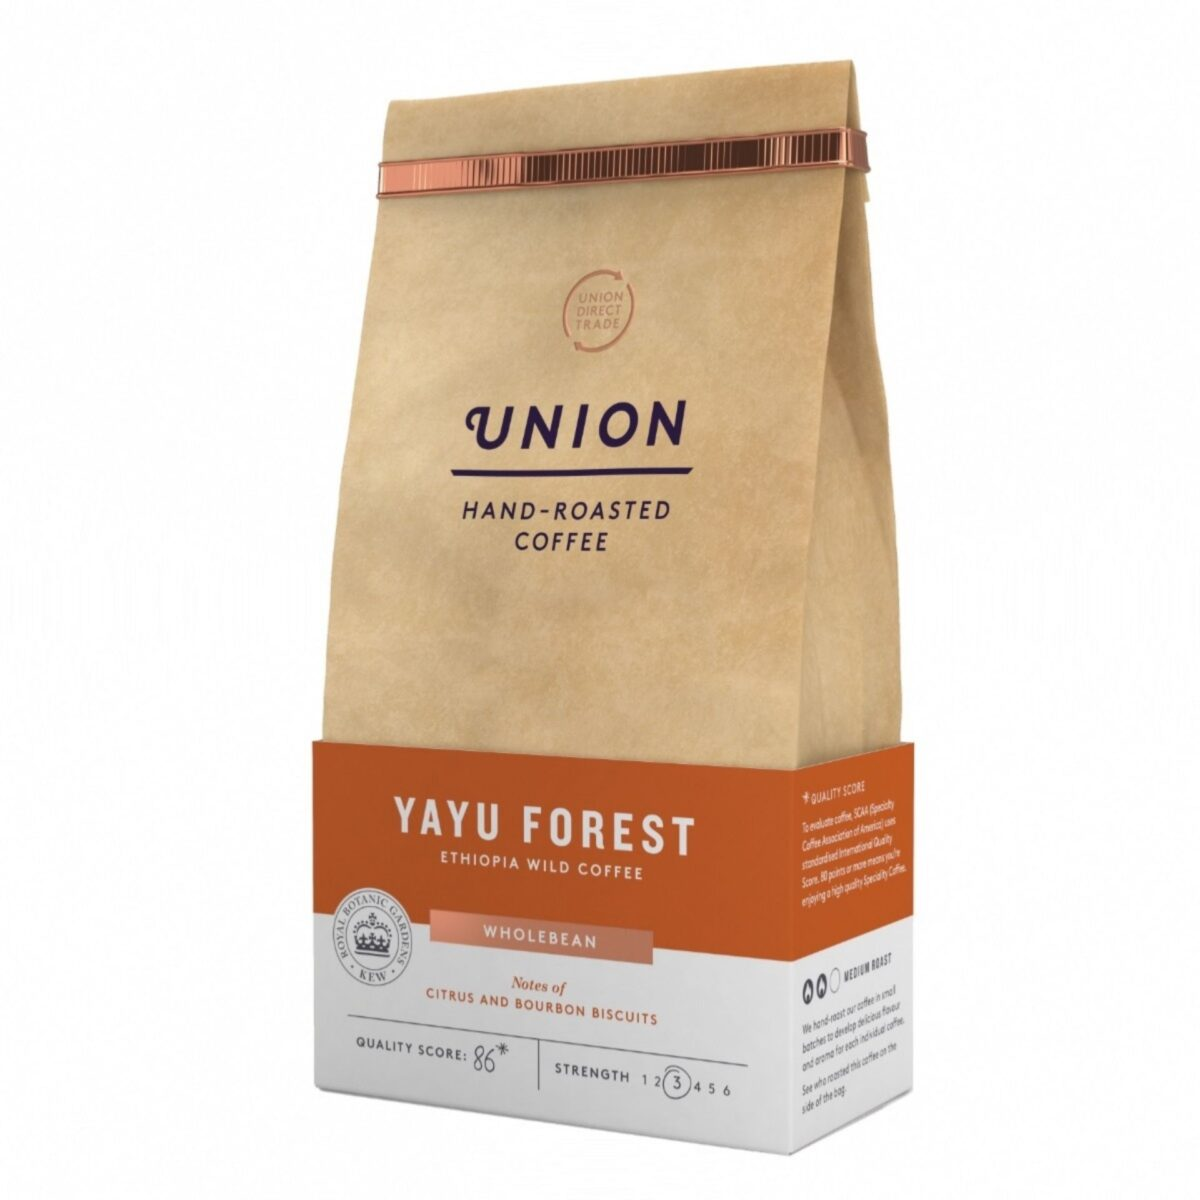 union-wholebean-coffee-yayu-forest-884357